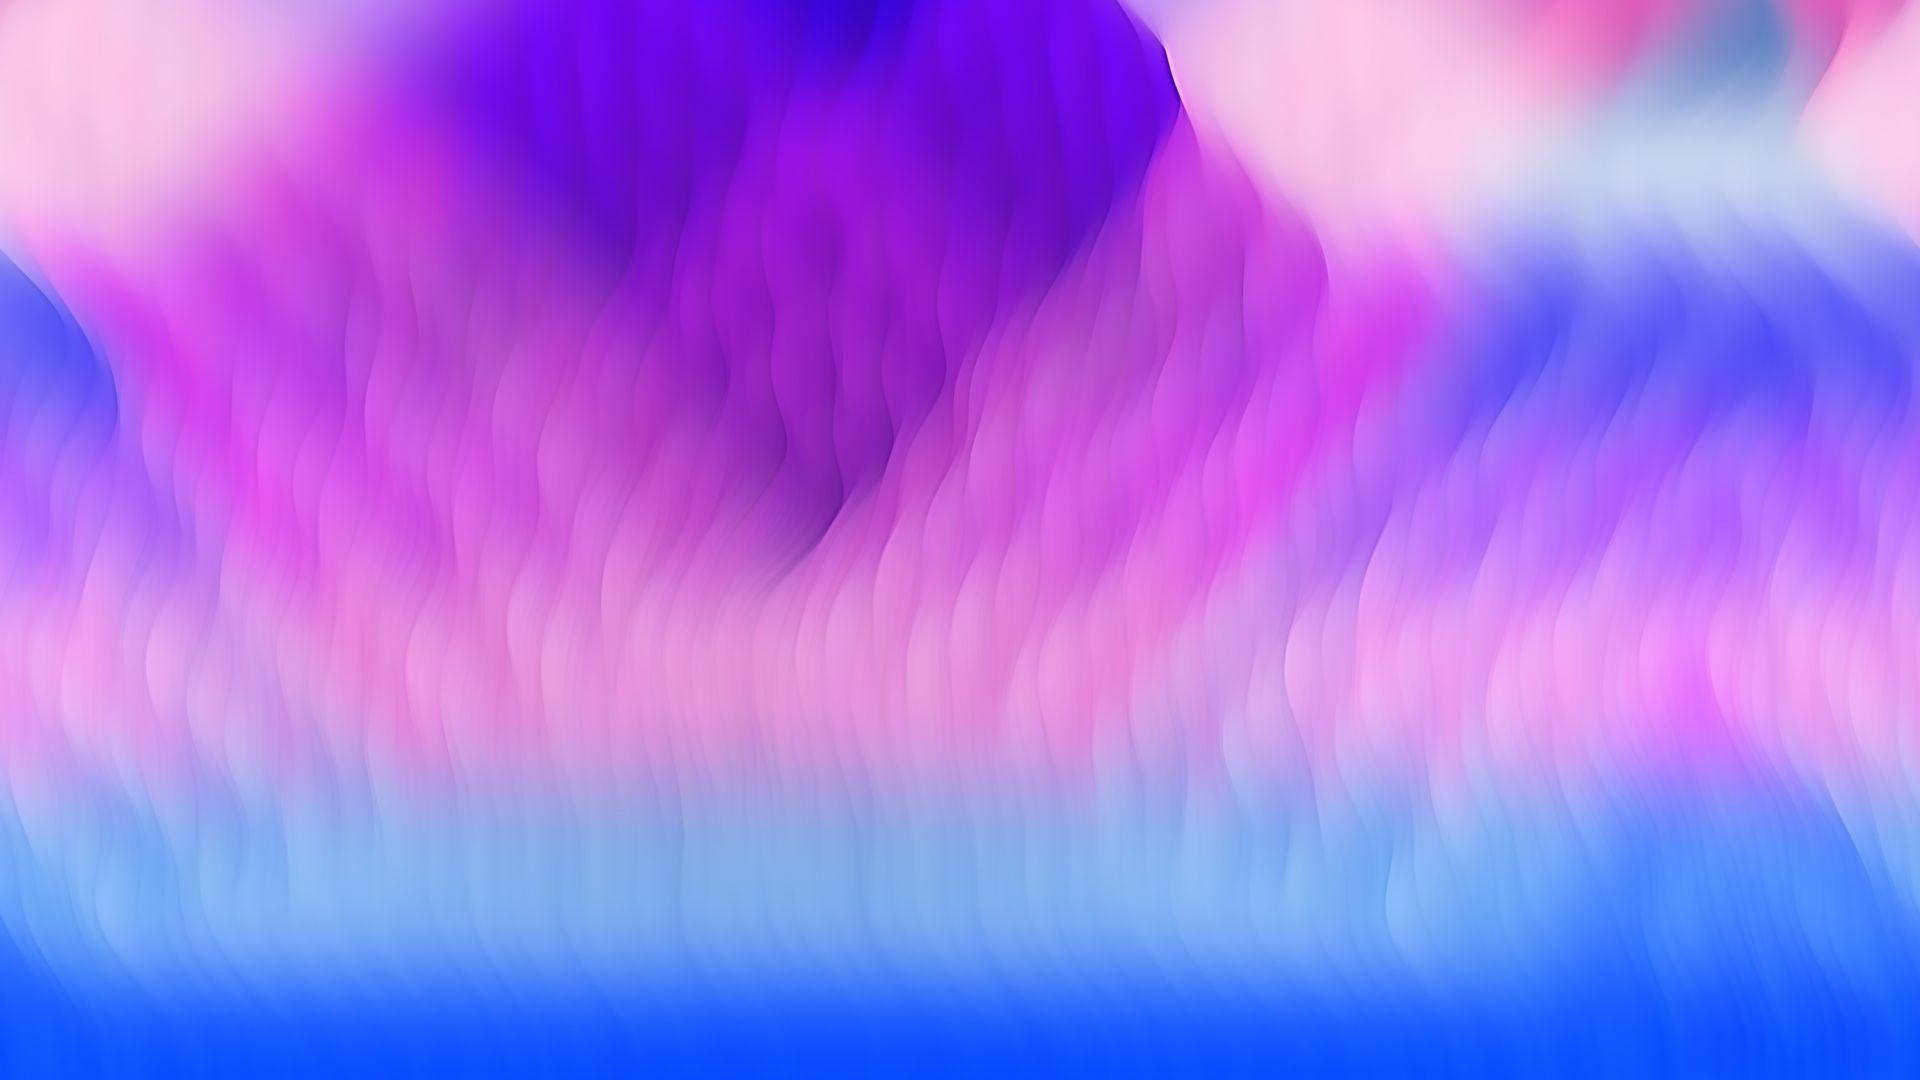 Wallpaper Blur, gradient, abstract